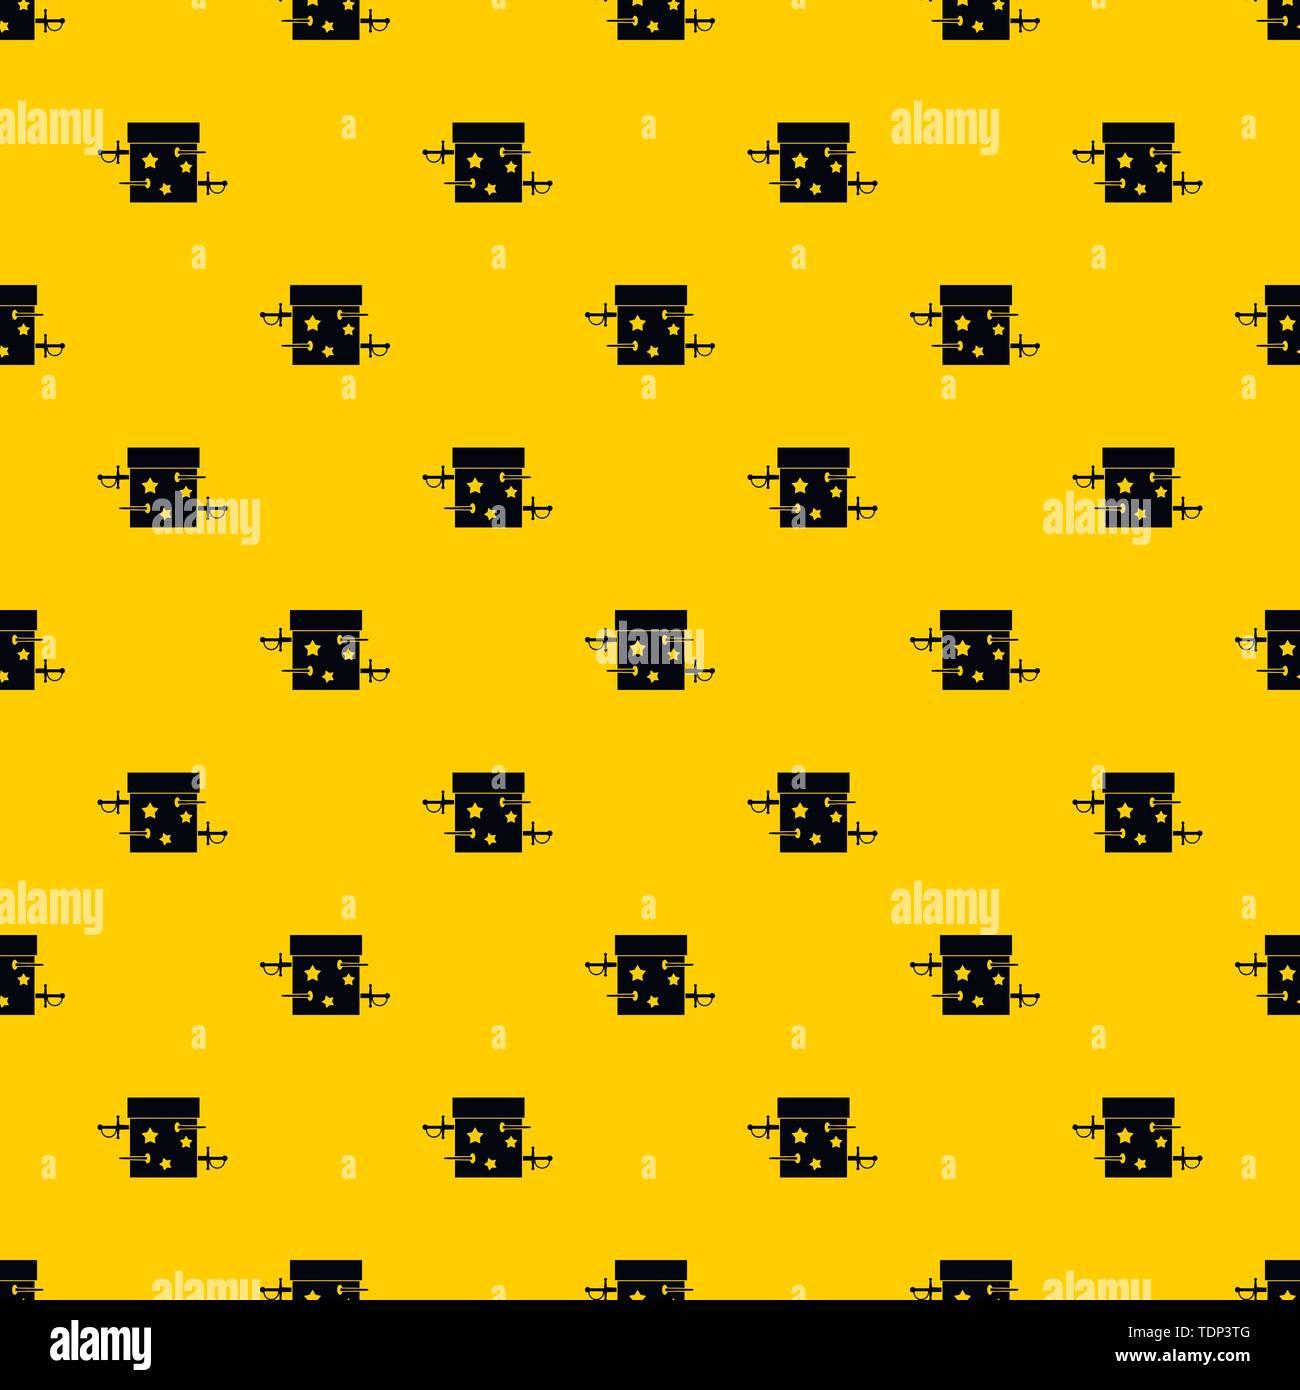 Sword box illusion pattern vector - Stock Image